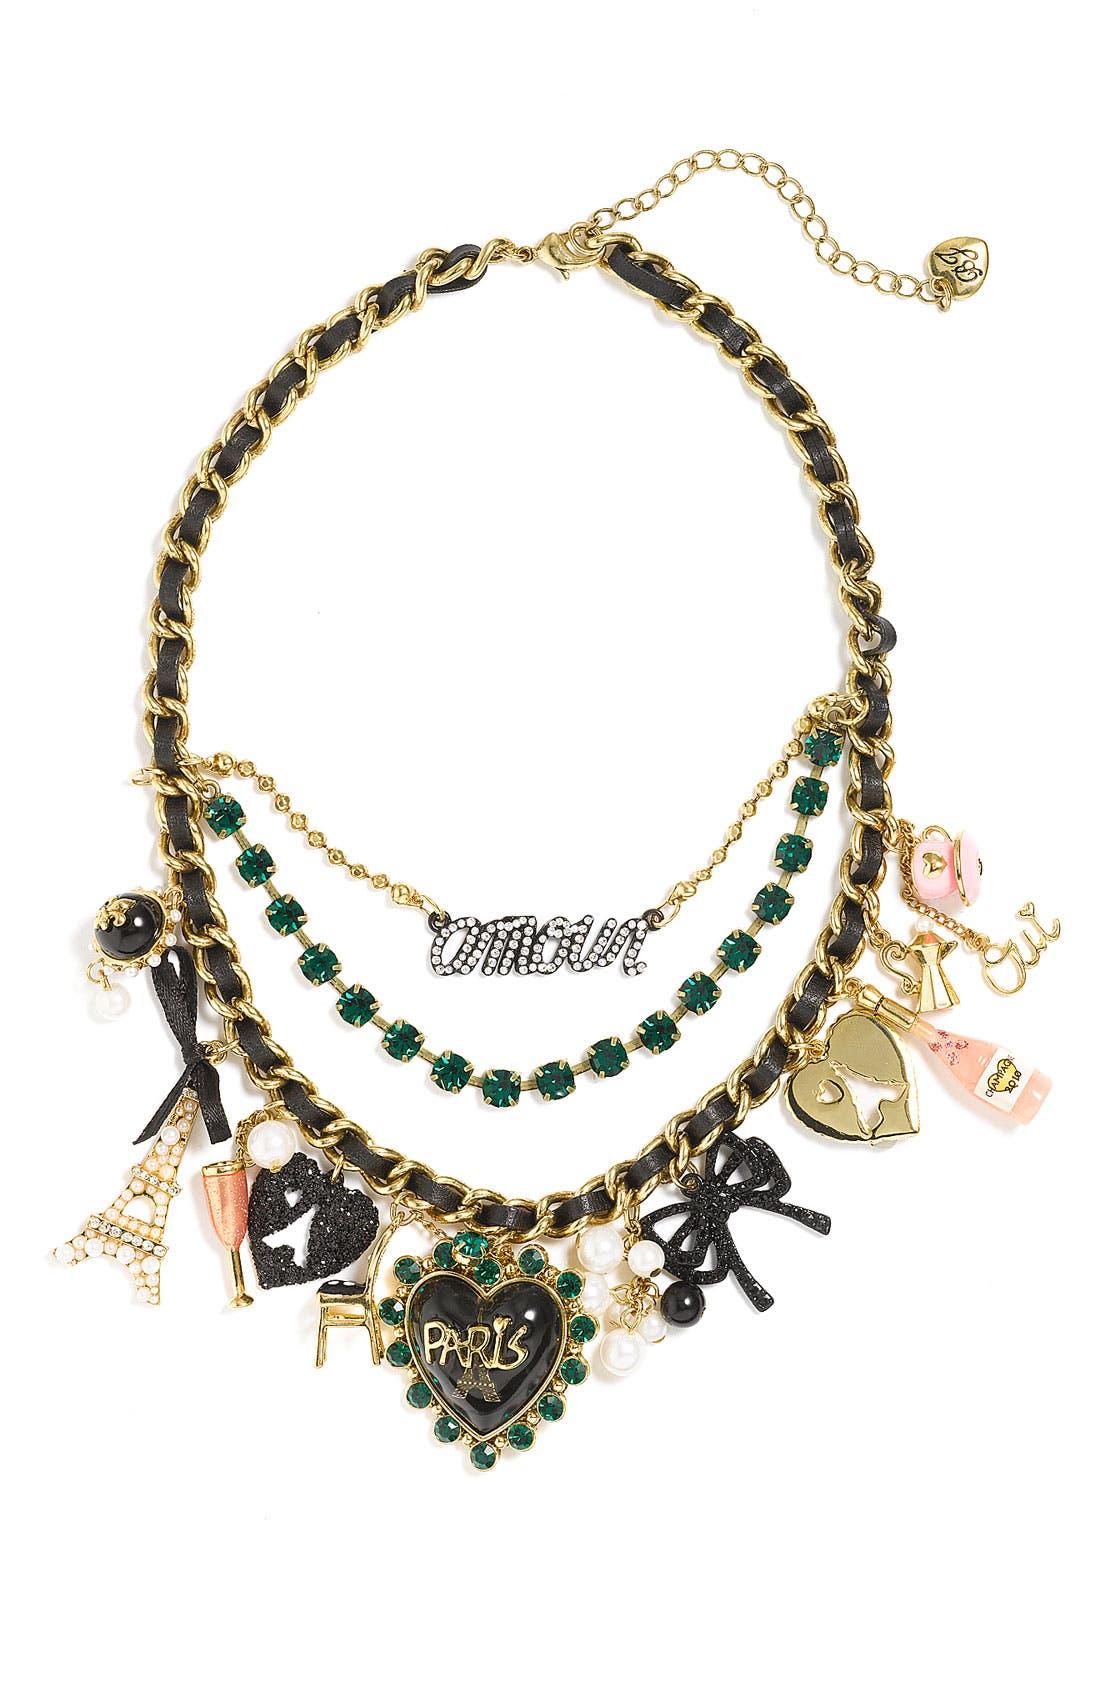 Alternate Image 1 Selected - Betsey Johnson 'Paris Case' Cluster Necklace